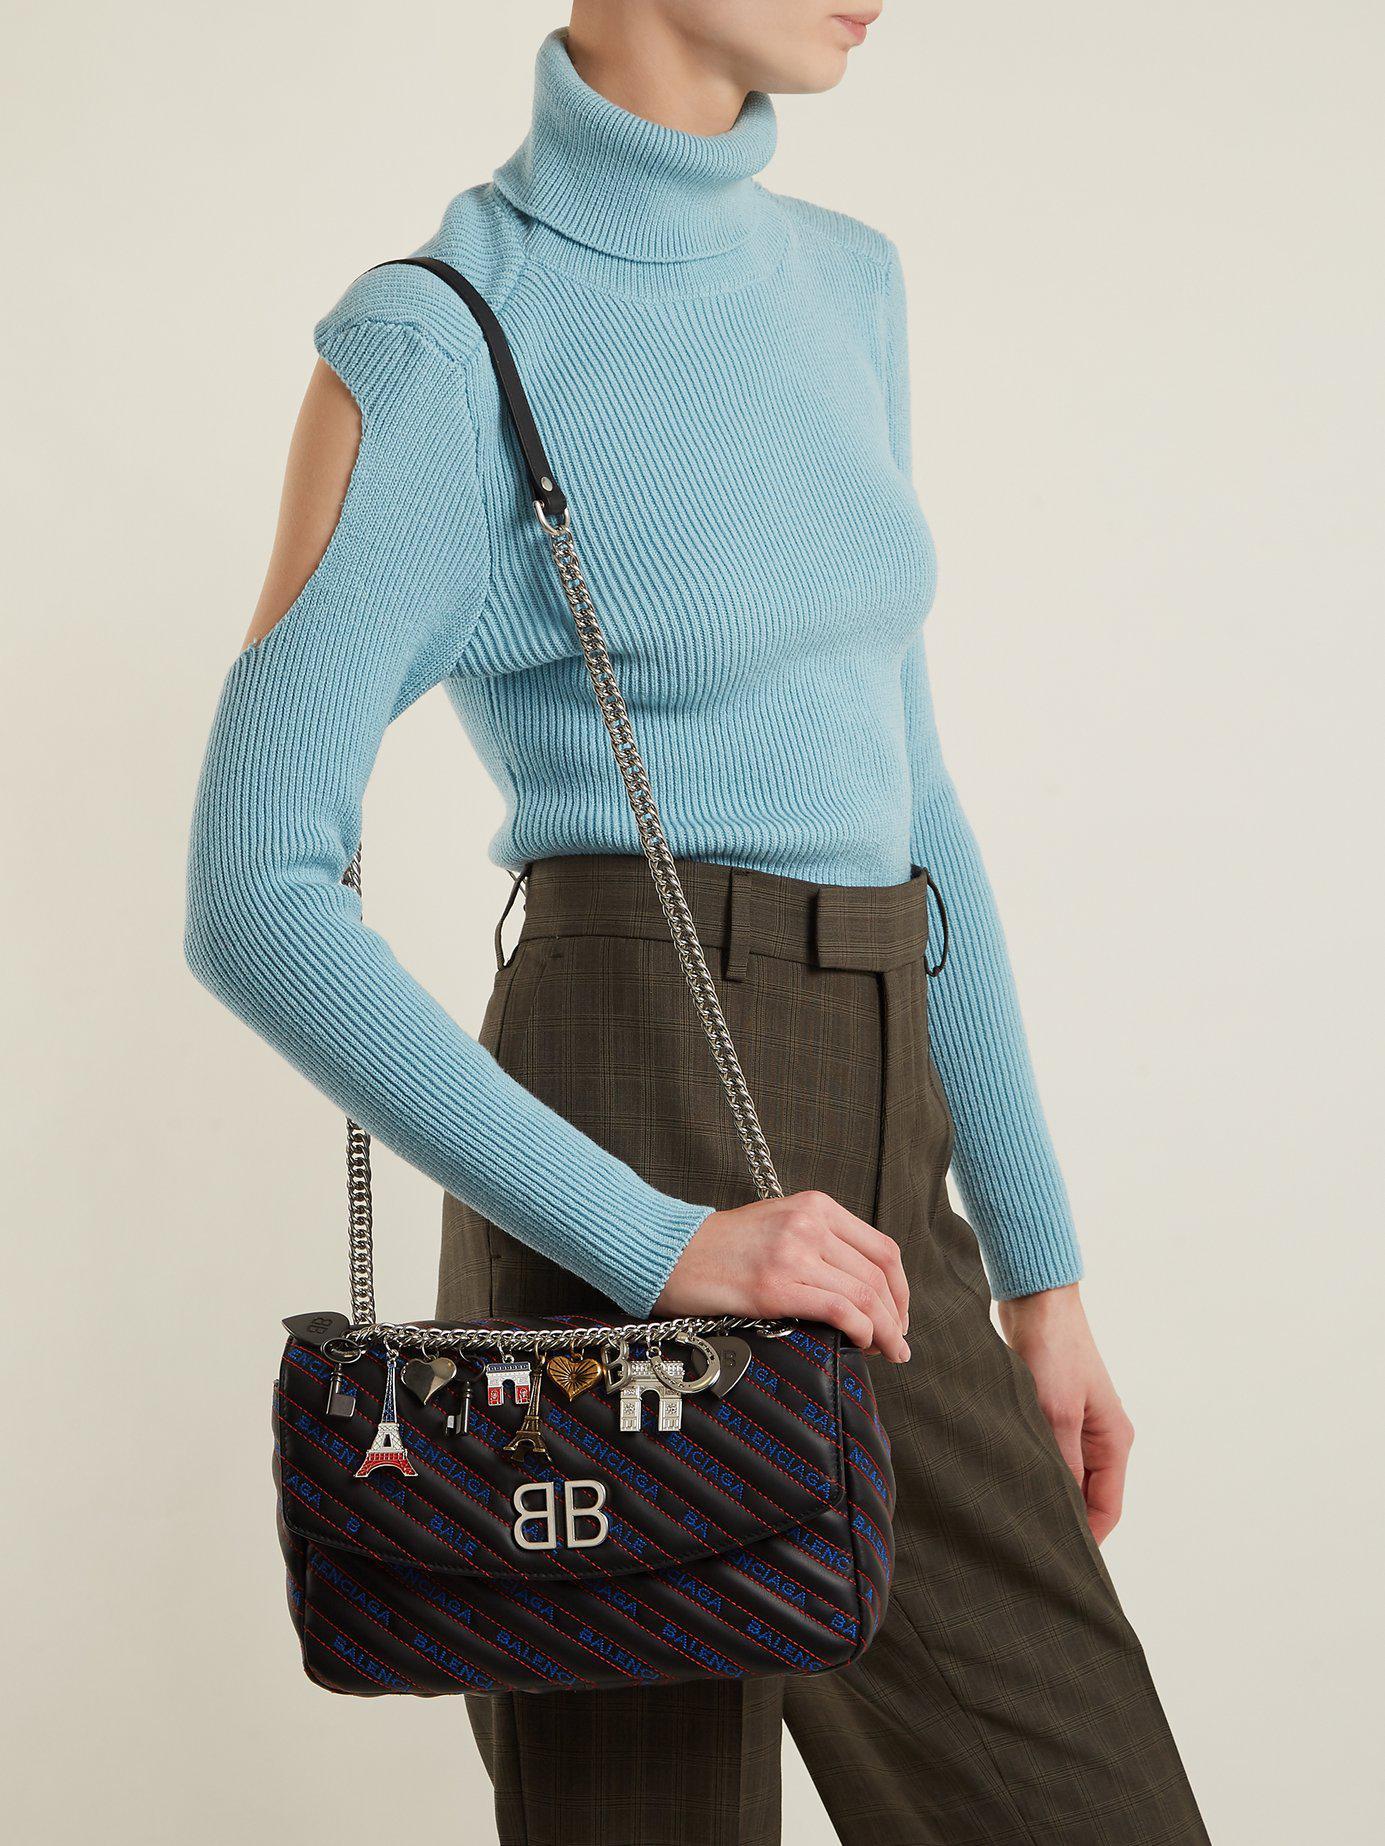 bacd16ed44a219 Balenciaga Bb Round M Bag in Black - Lyst